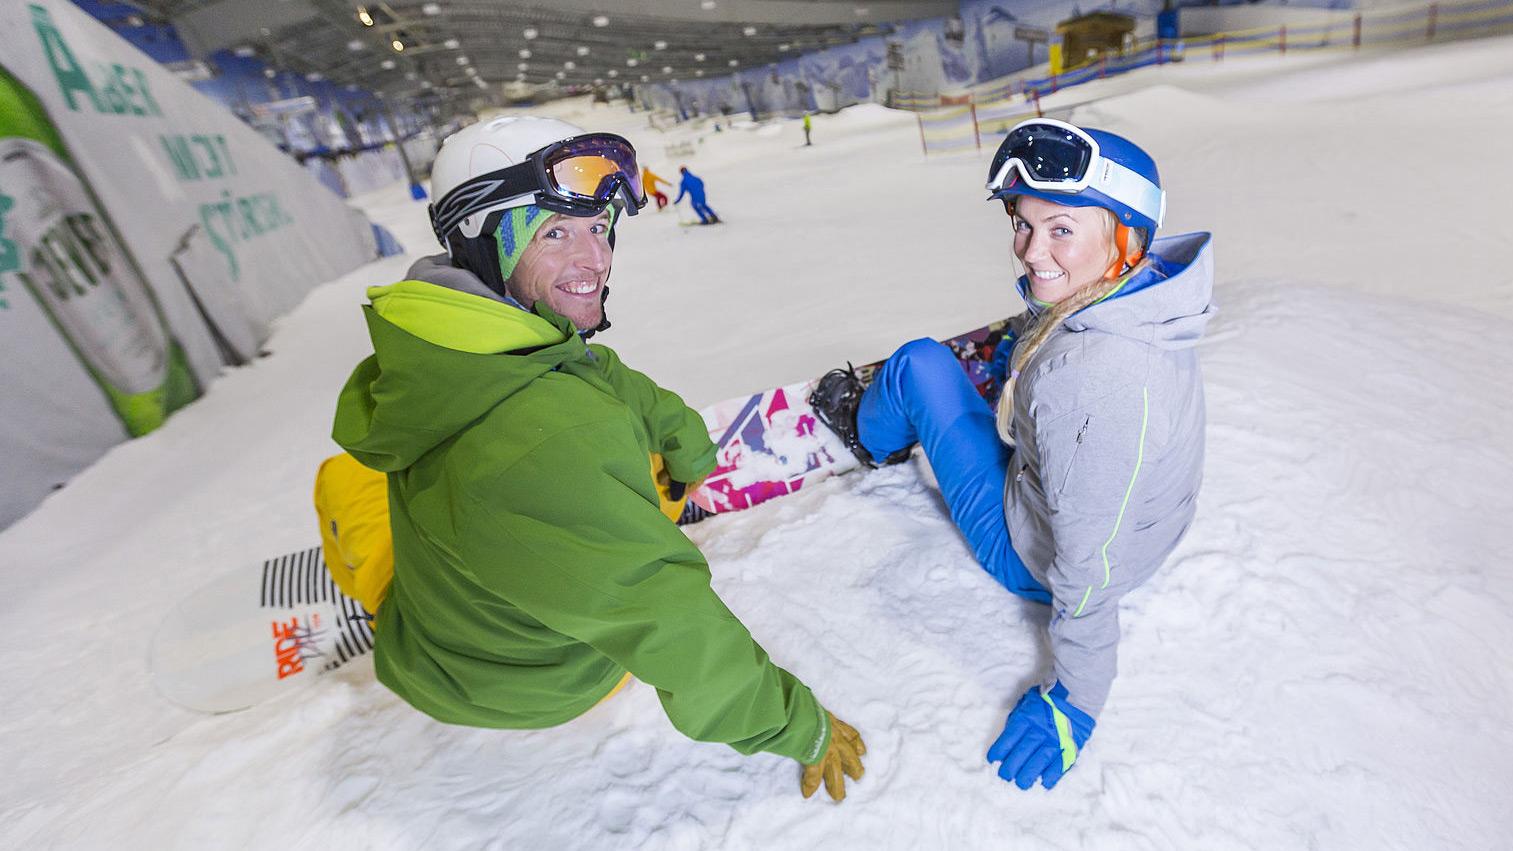 Bilder Skihalle Neuss Halloween.Alpenpark Neuss 2019 Neu Mit Tagesticket Alpenpark Ticket